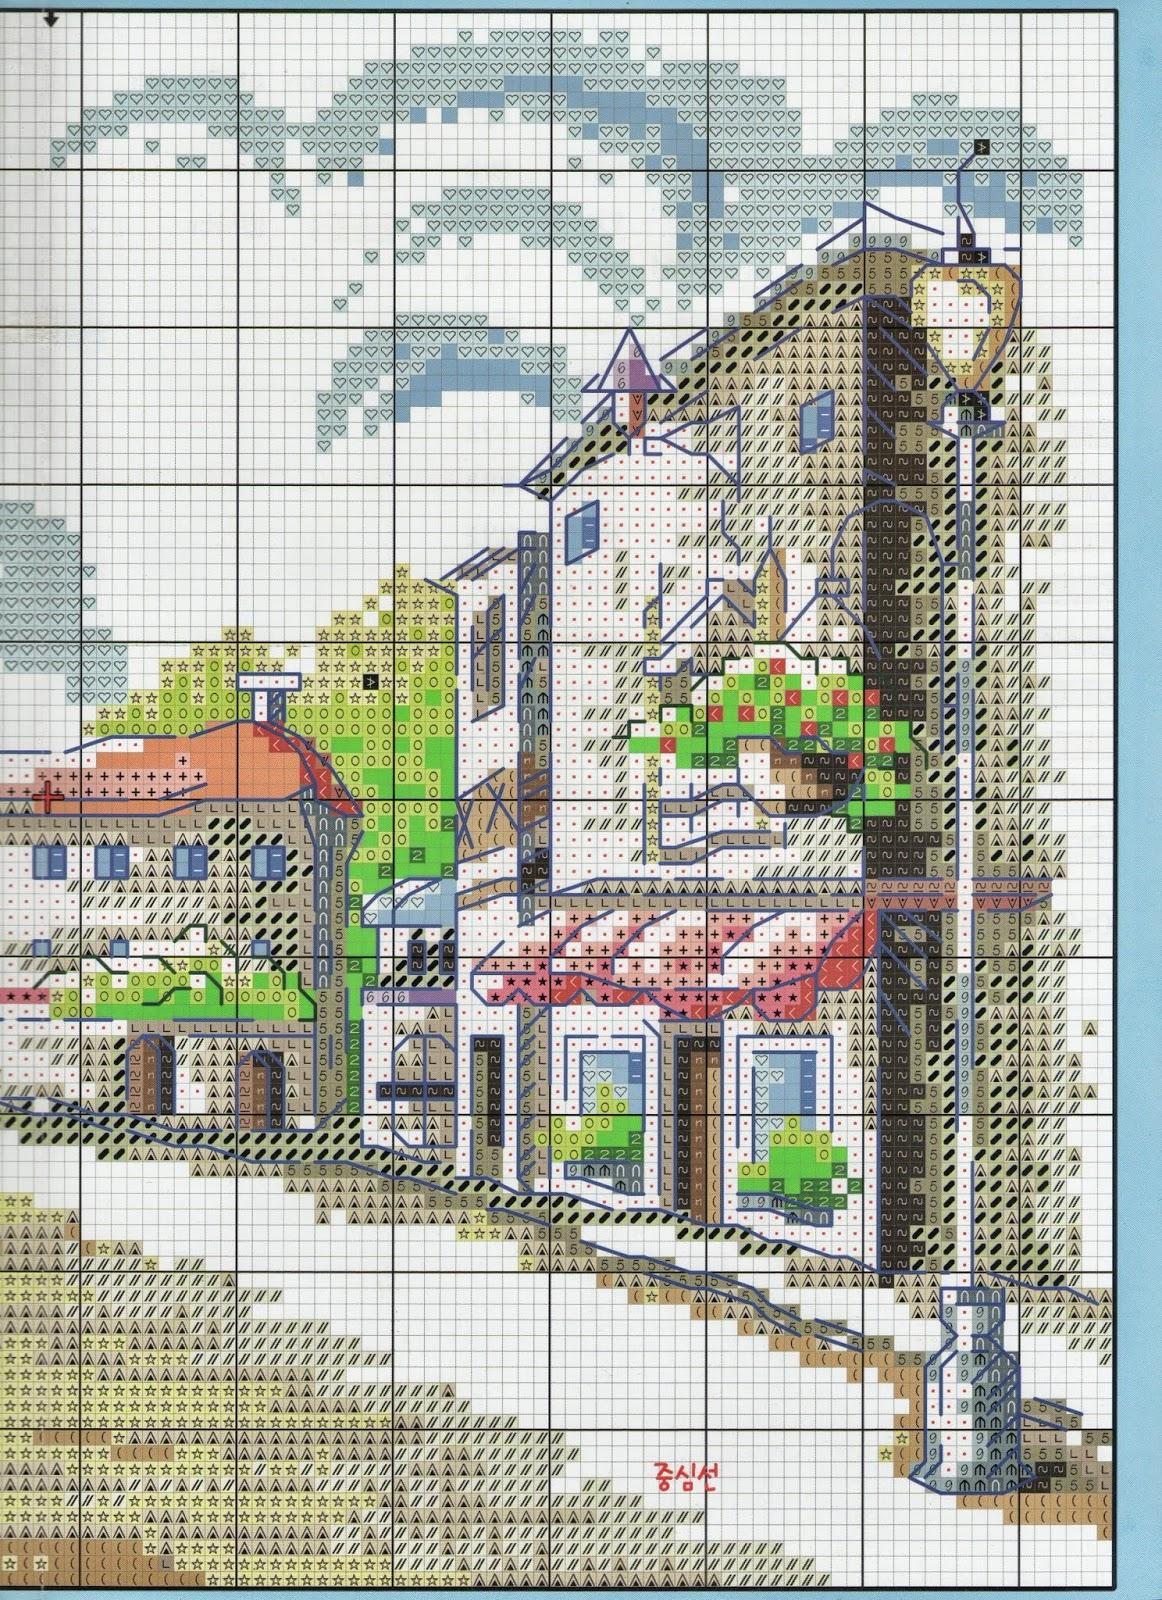 Ricami e schemi a punto croce gratuiti paesaggio urbano a for Schemi a punto croce gratis